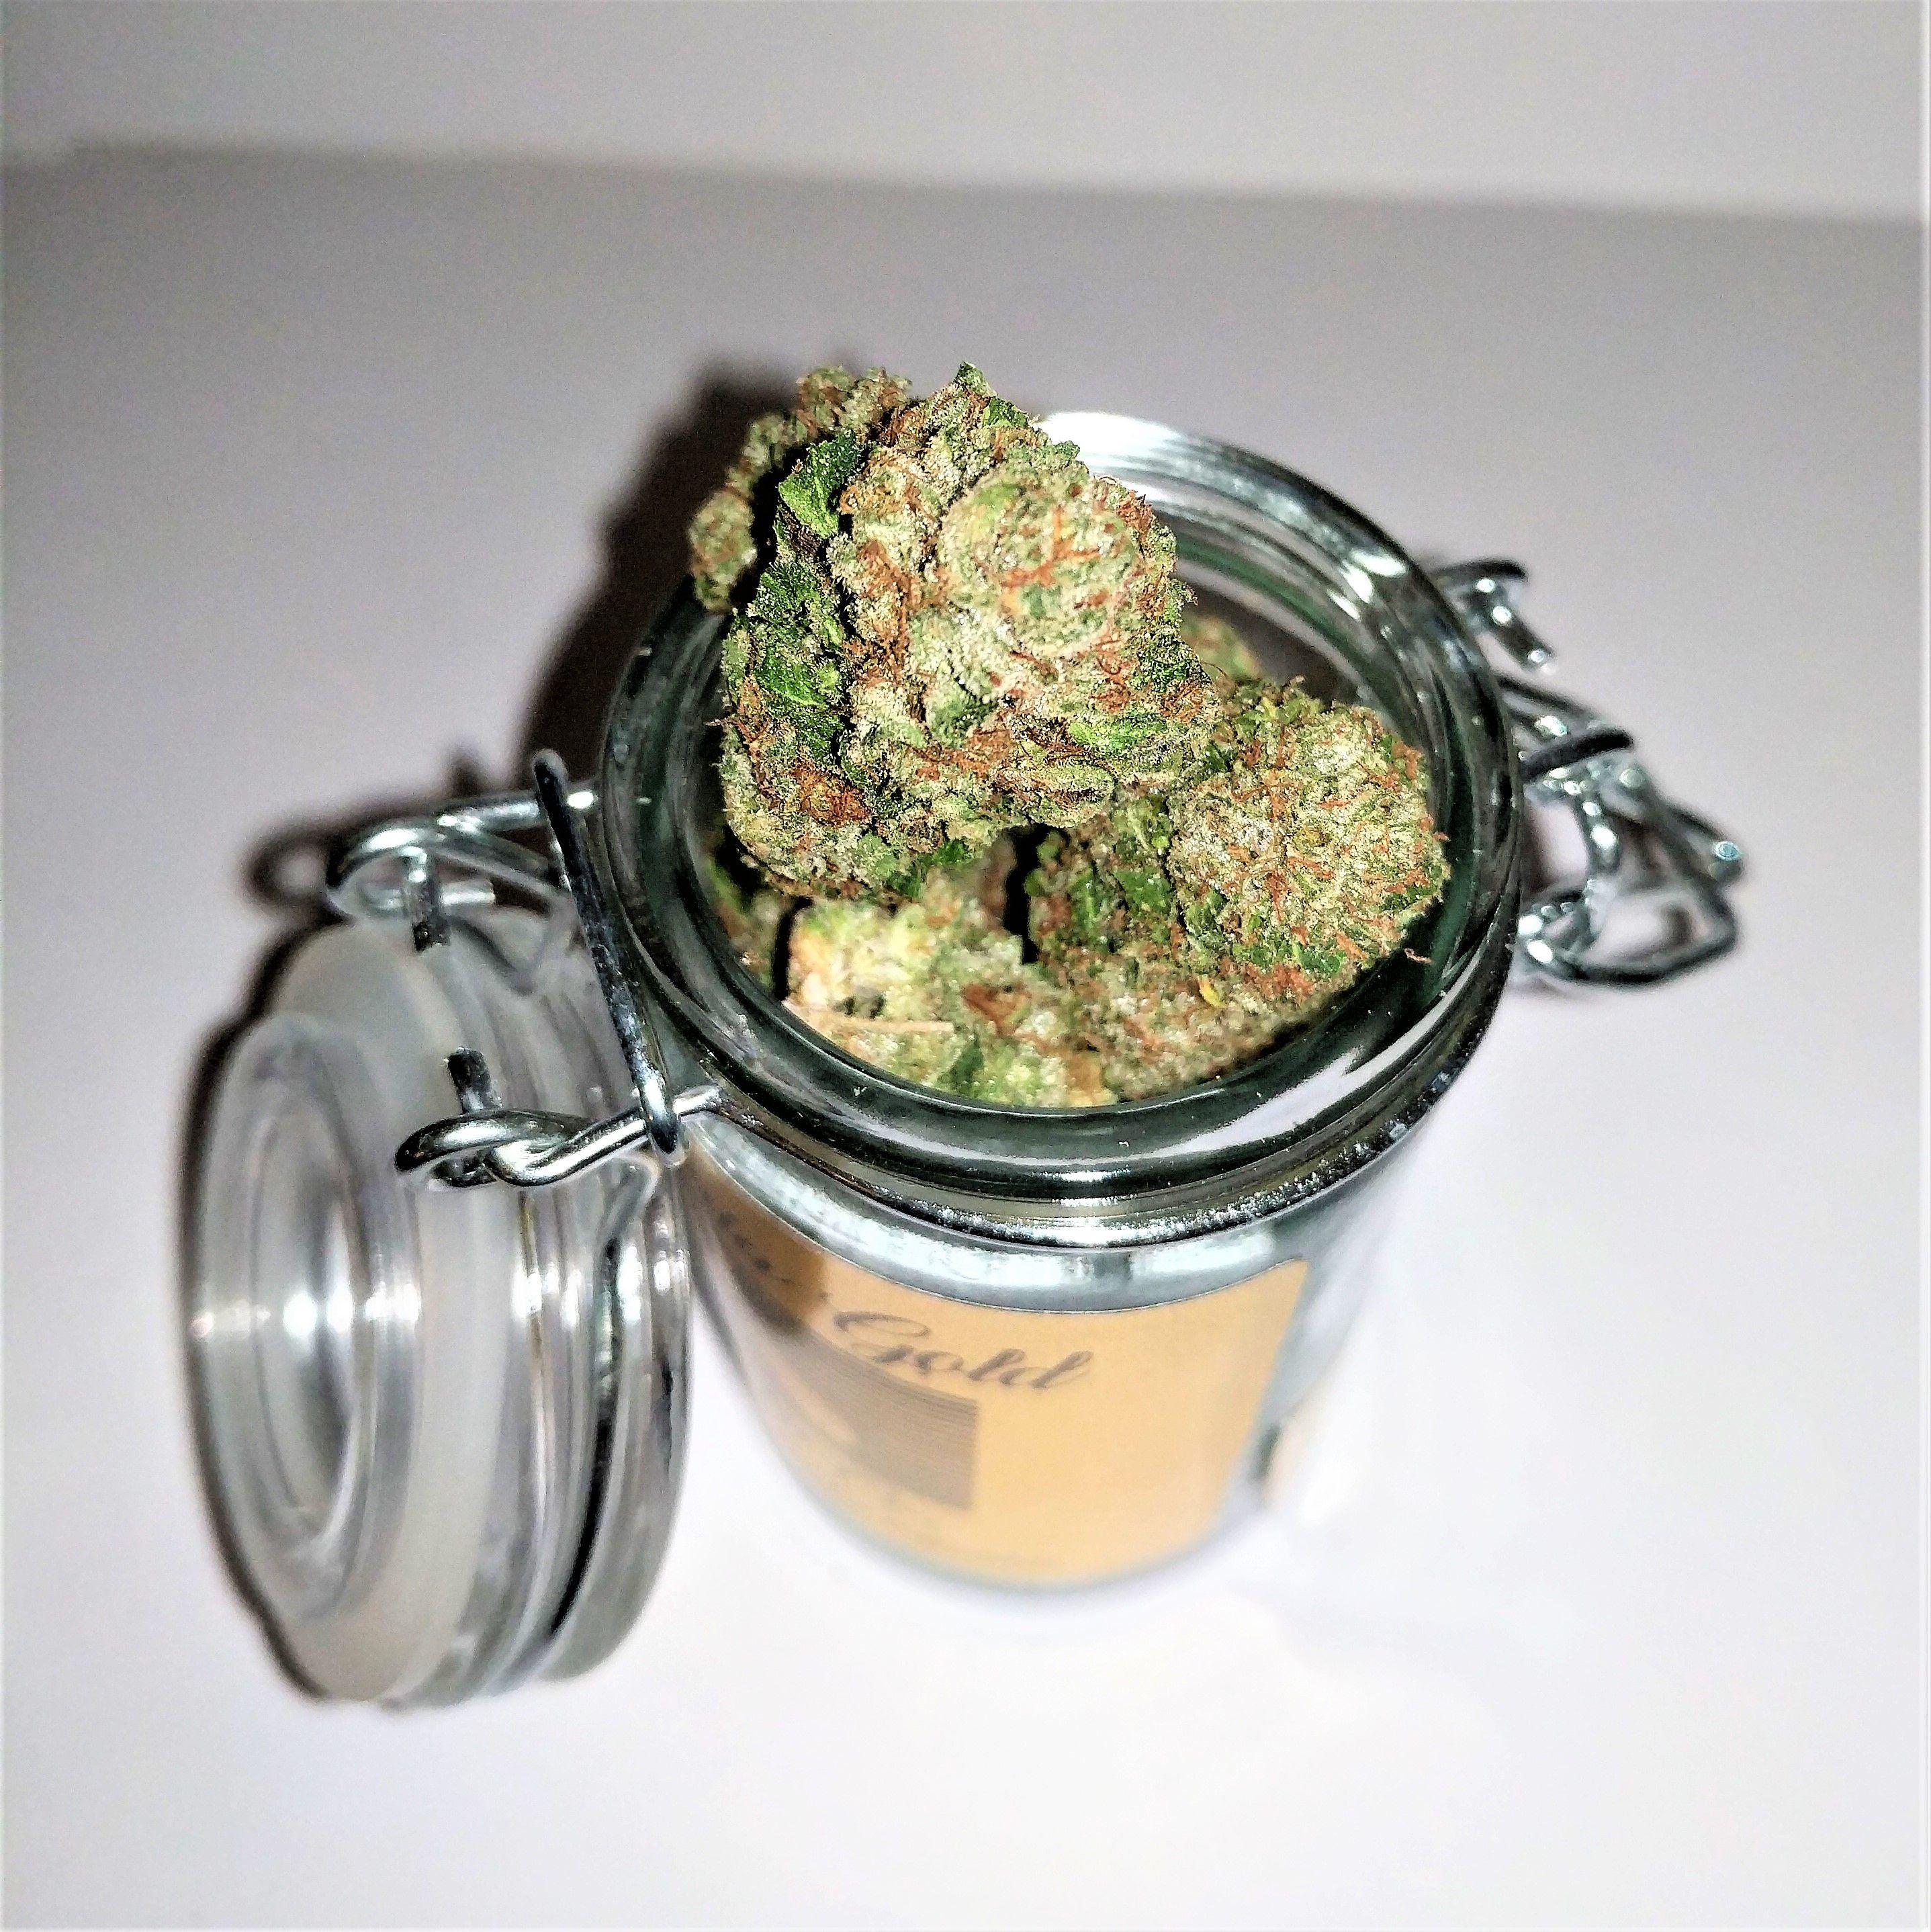 California Gold Cannabis Co. Coastal Kush